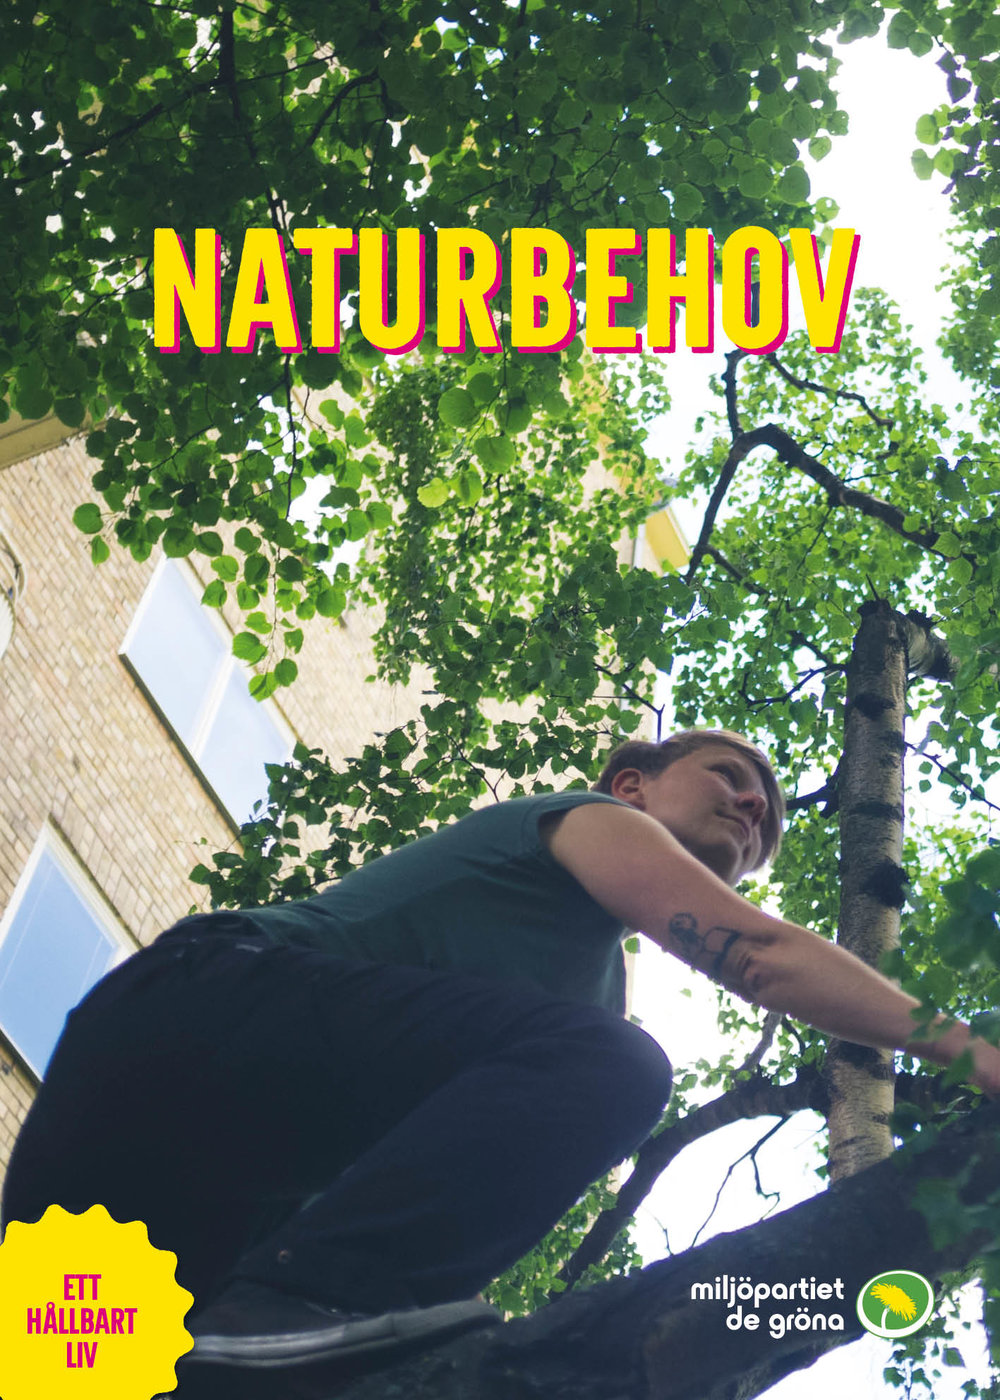 Naturbehov_Print_KR4.jpg